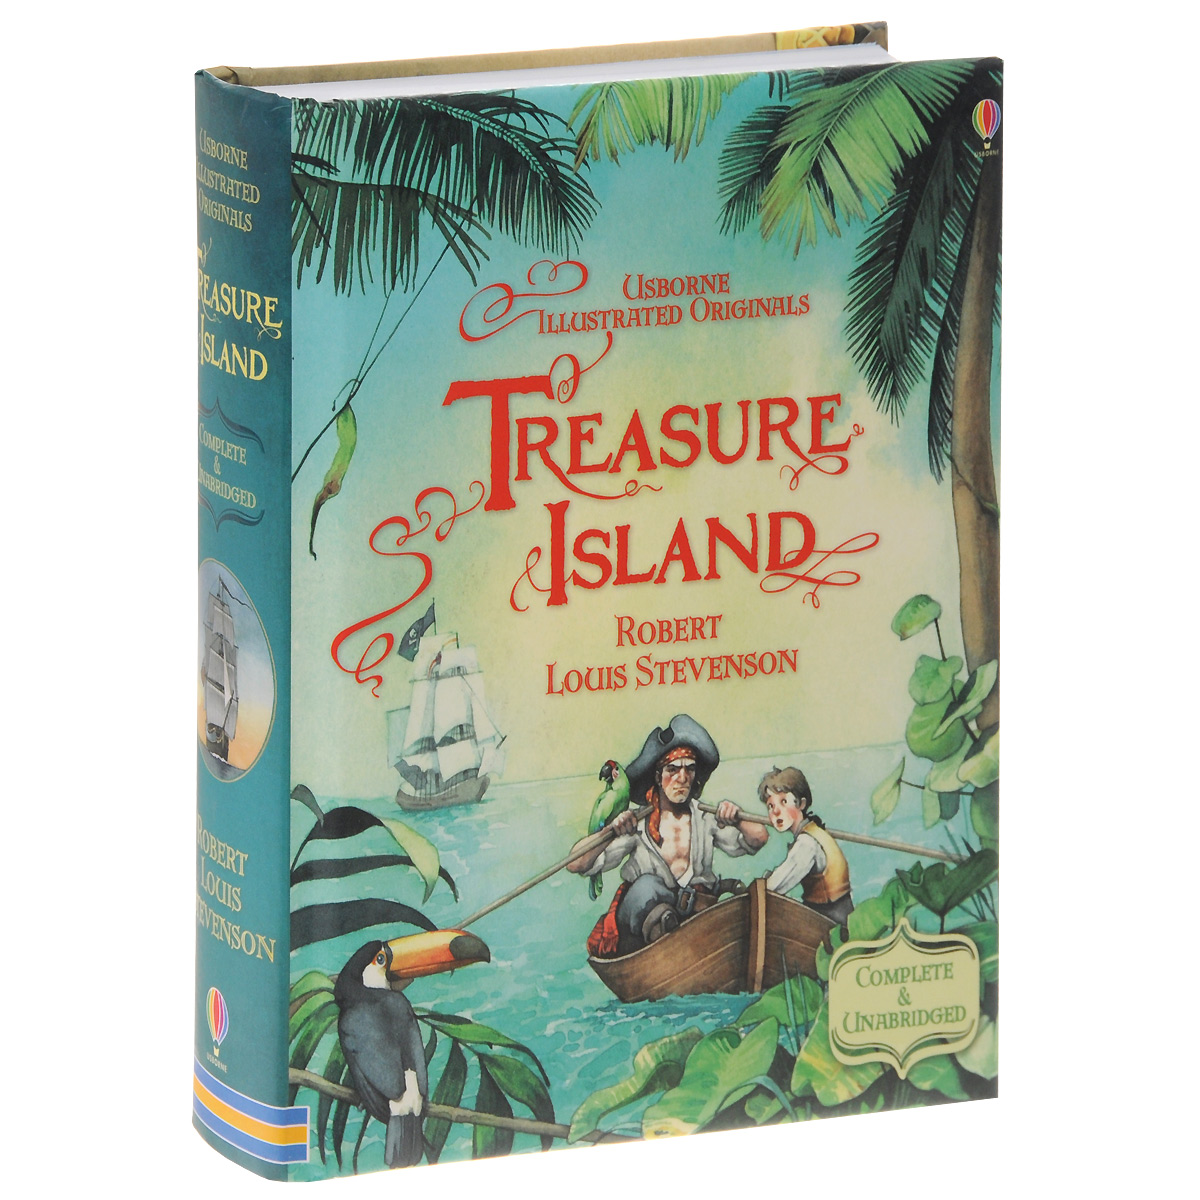 Treasure Island treasure hunters quest for the city of gold